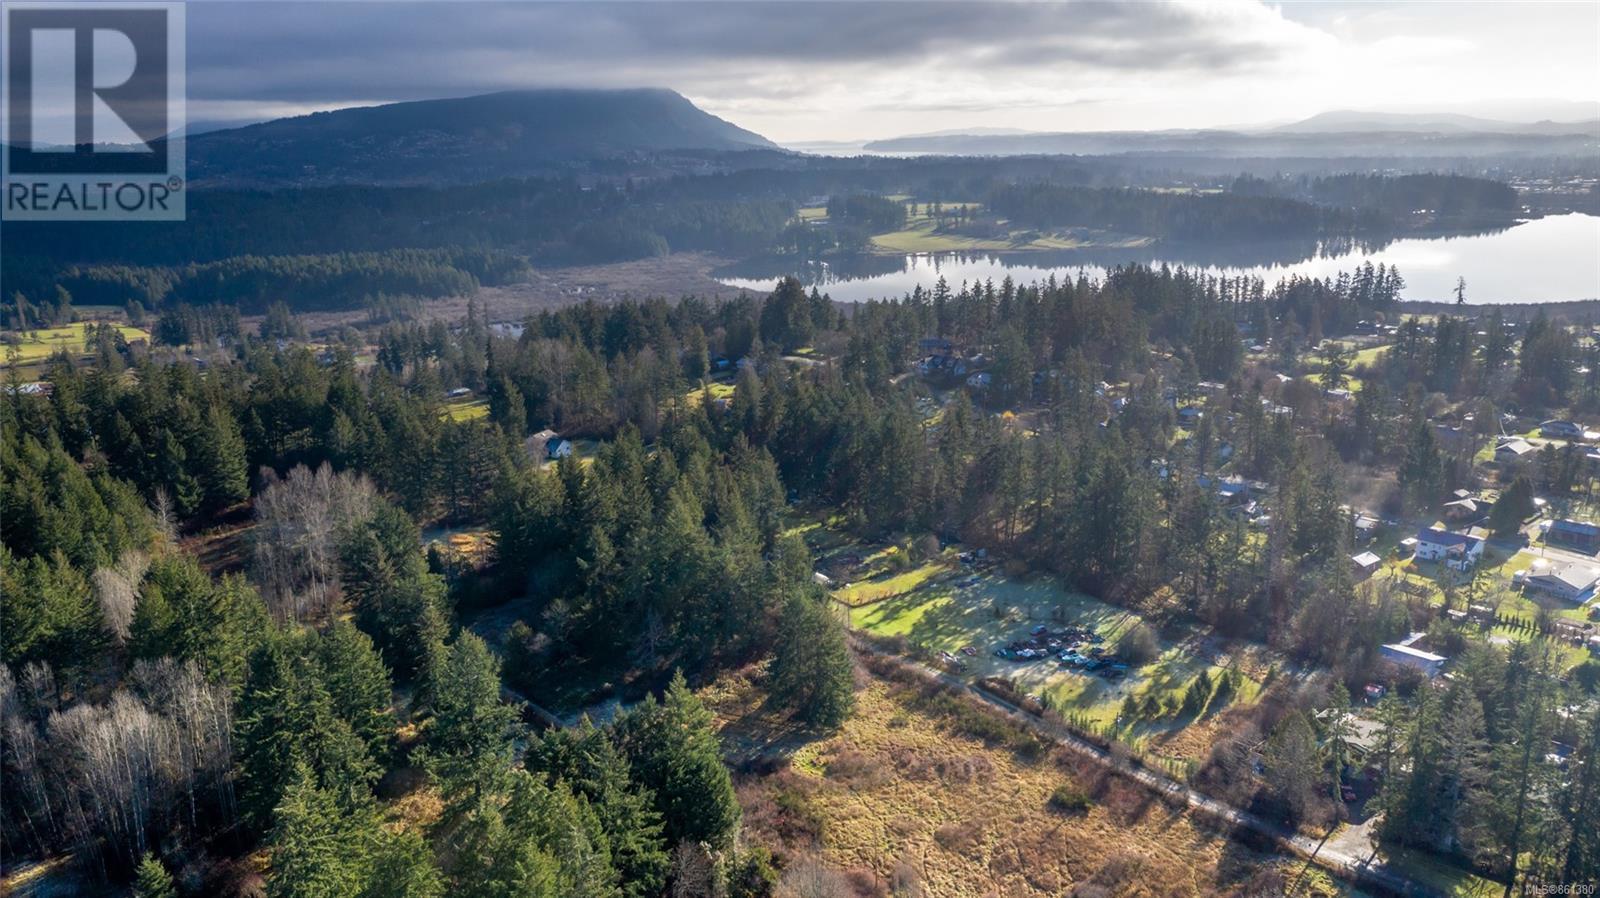 6790 Bell Mckinnon RdDuncan, British Columbia  V9L 6B7 - Photo 7 - 861380